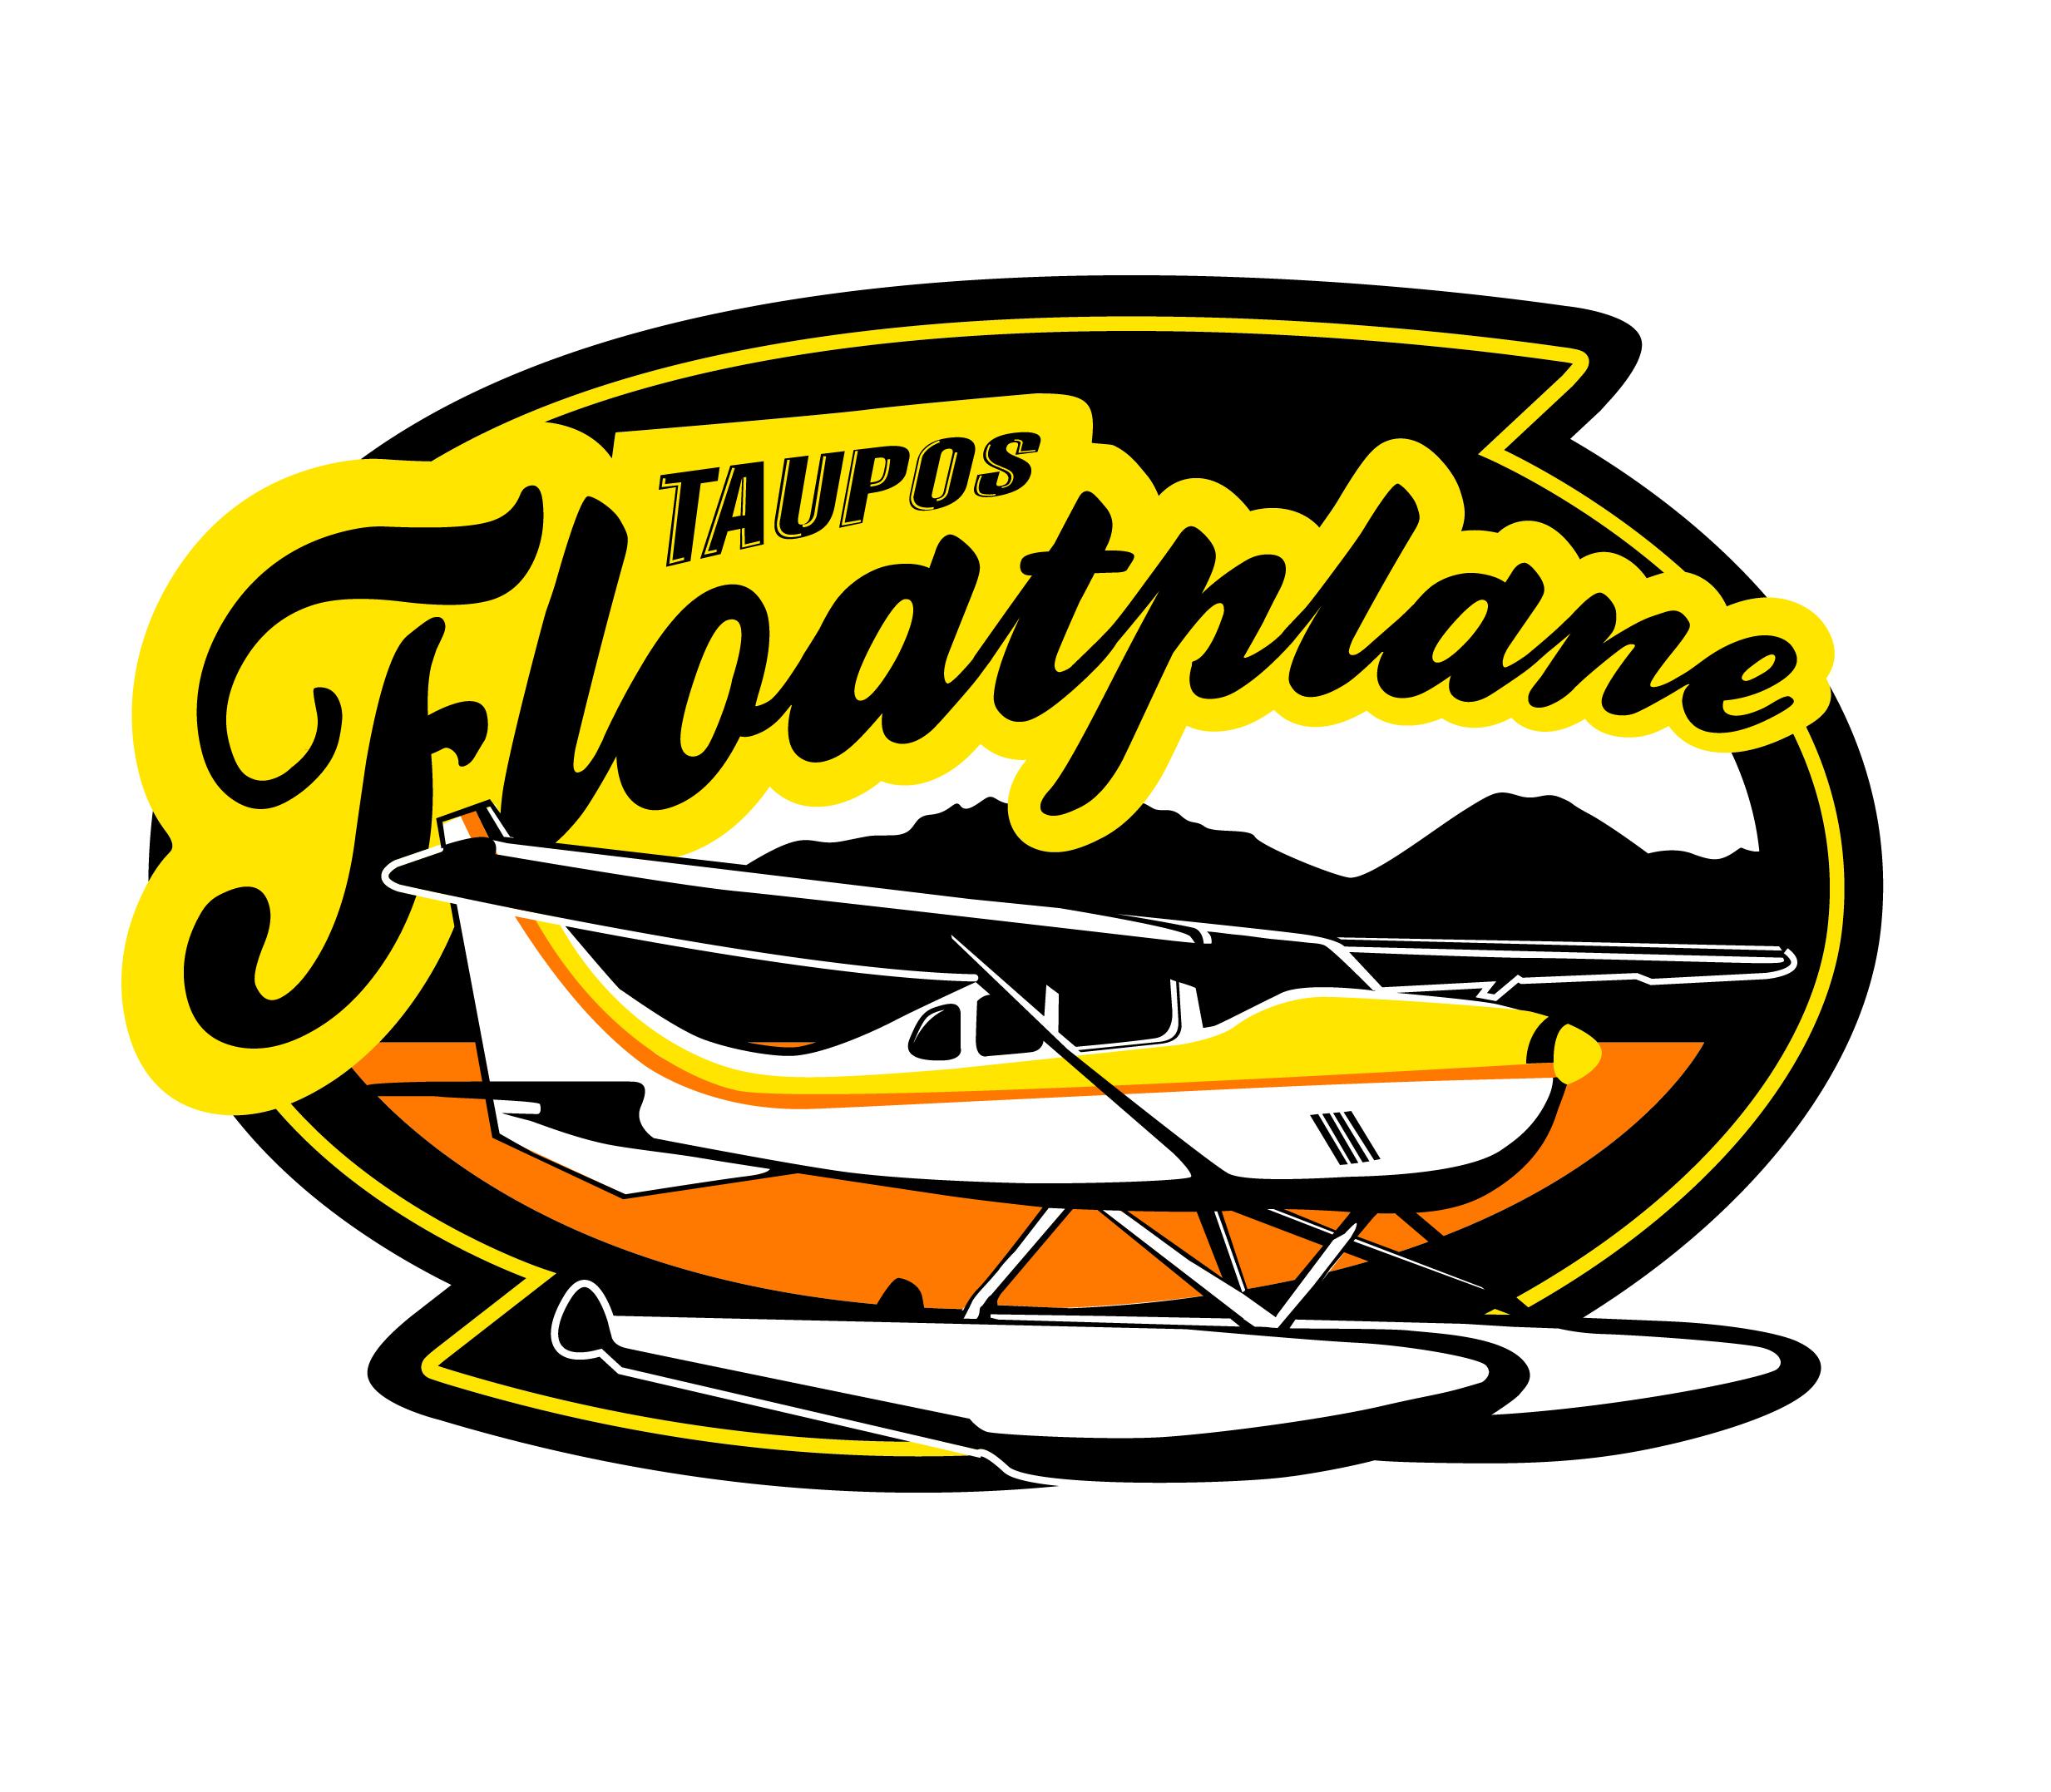 Taupo's Floatplane